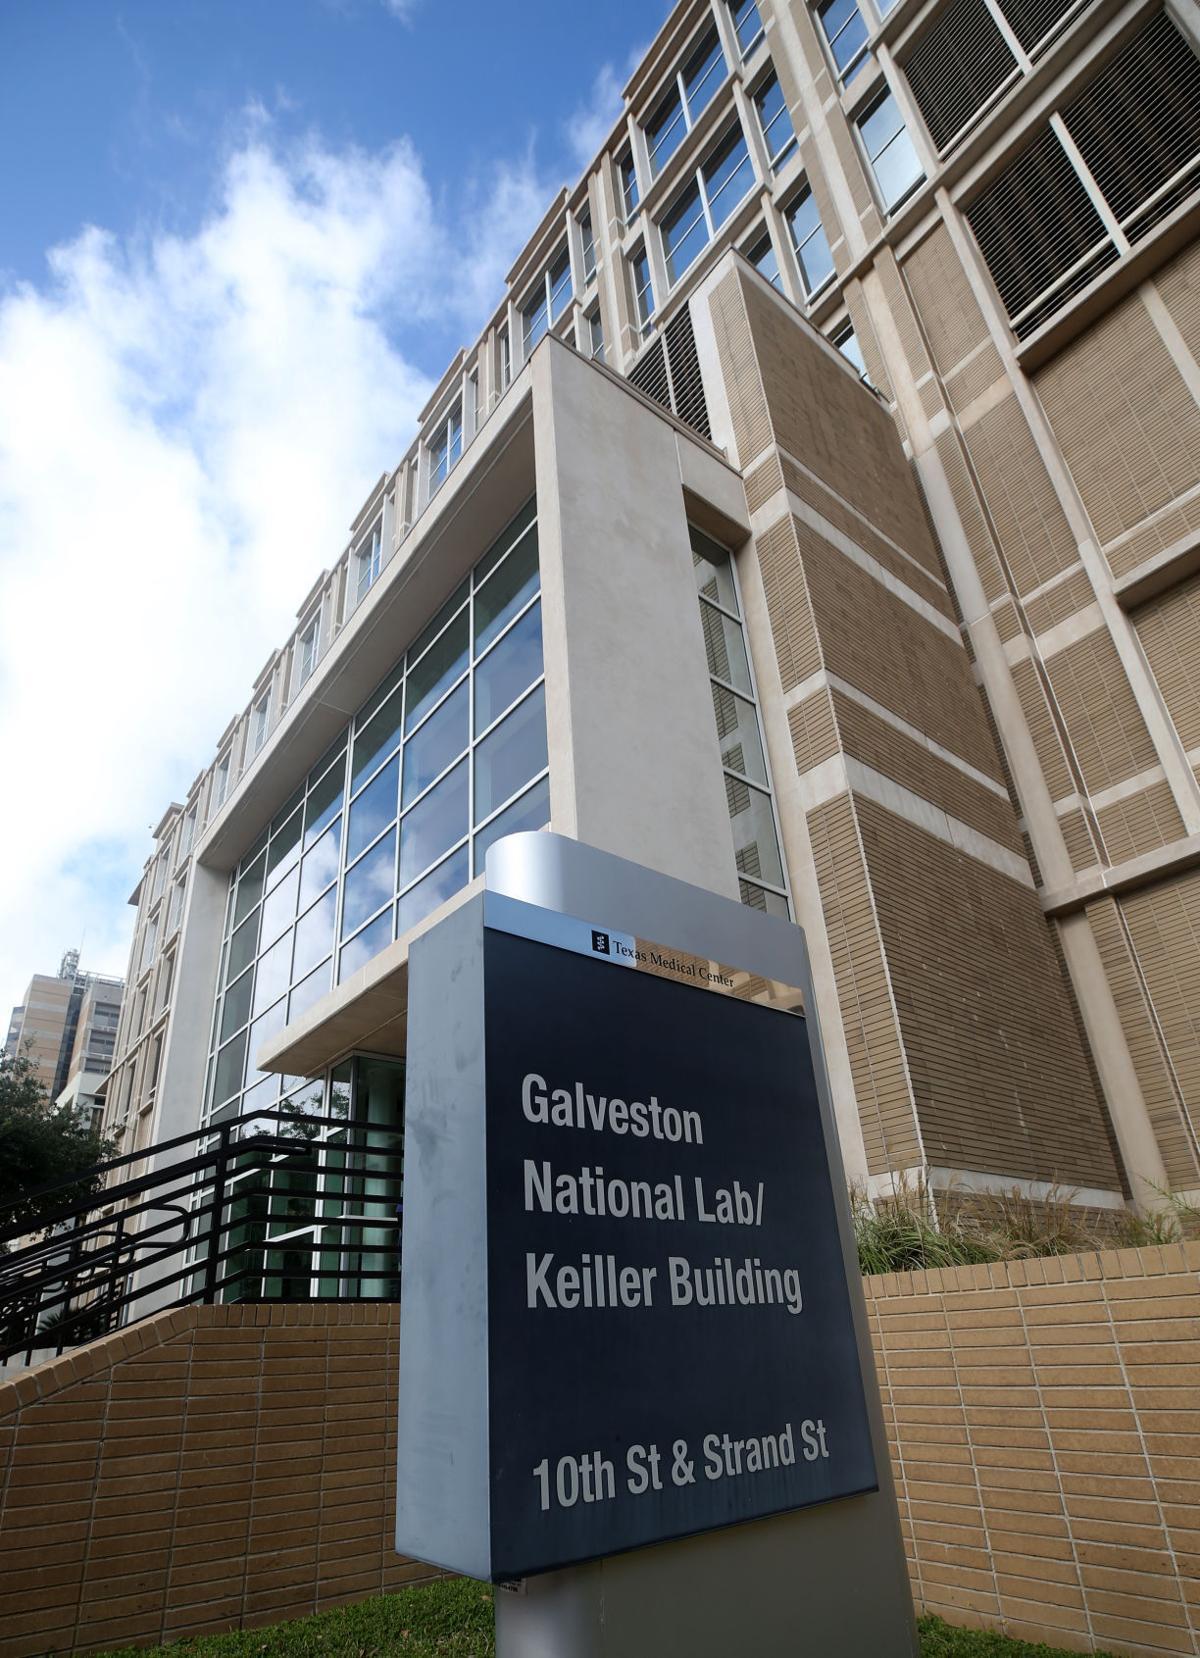 Galveston National Lab